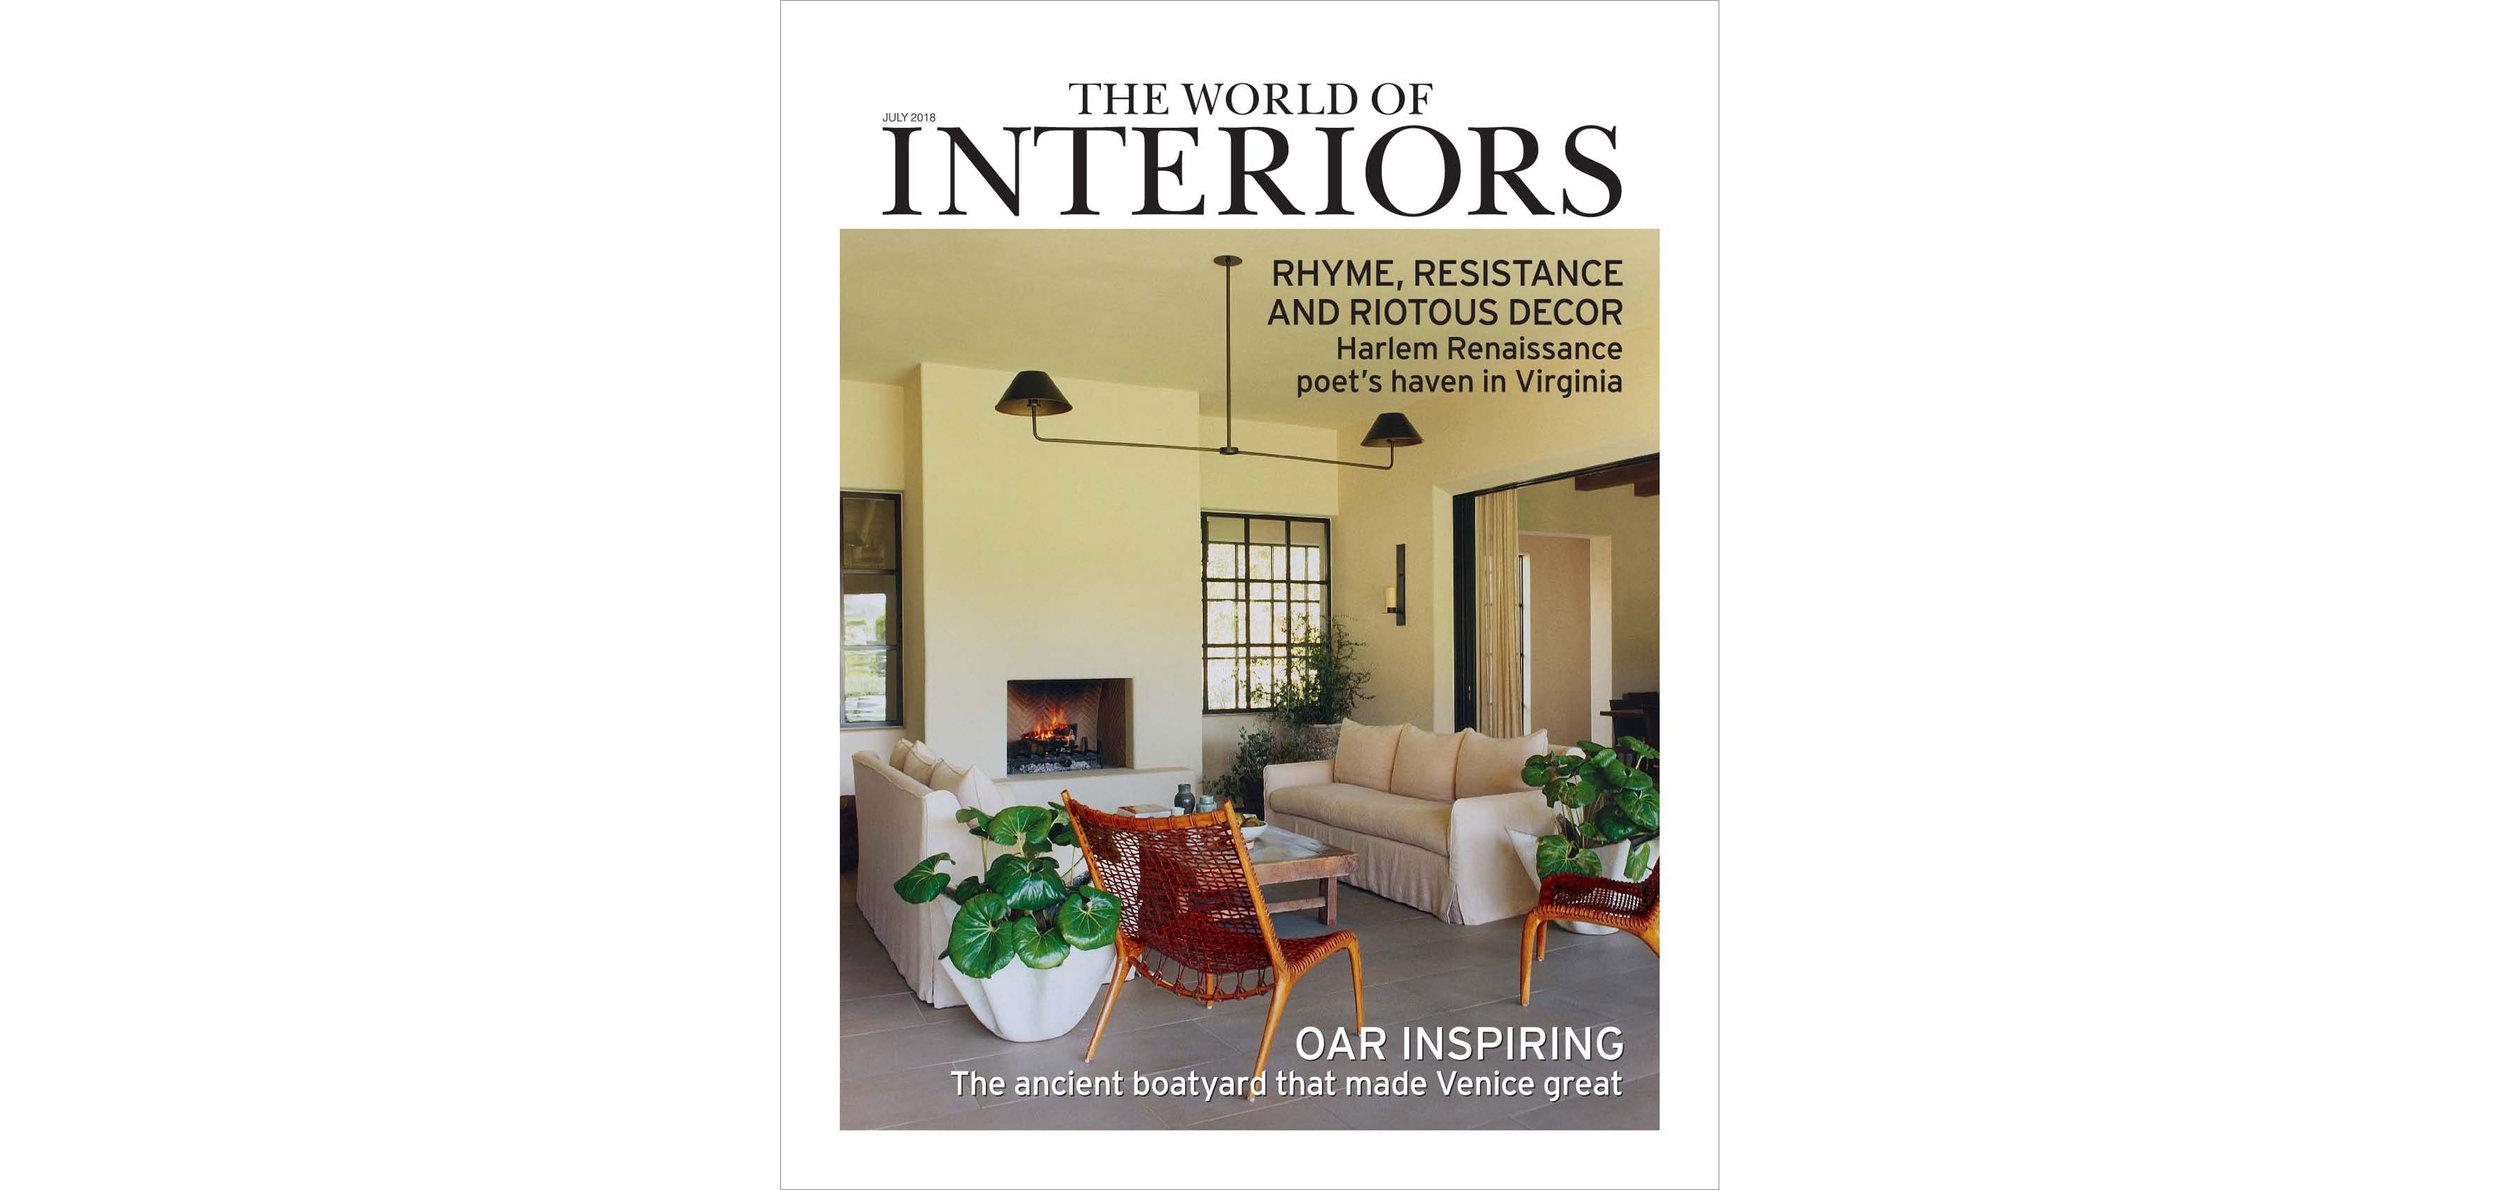 World-of-Interiors_Page_01.jpg